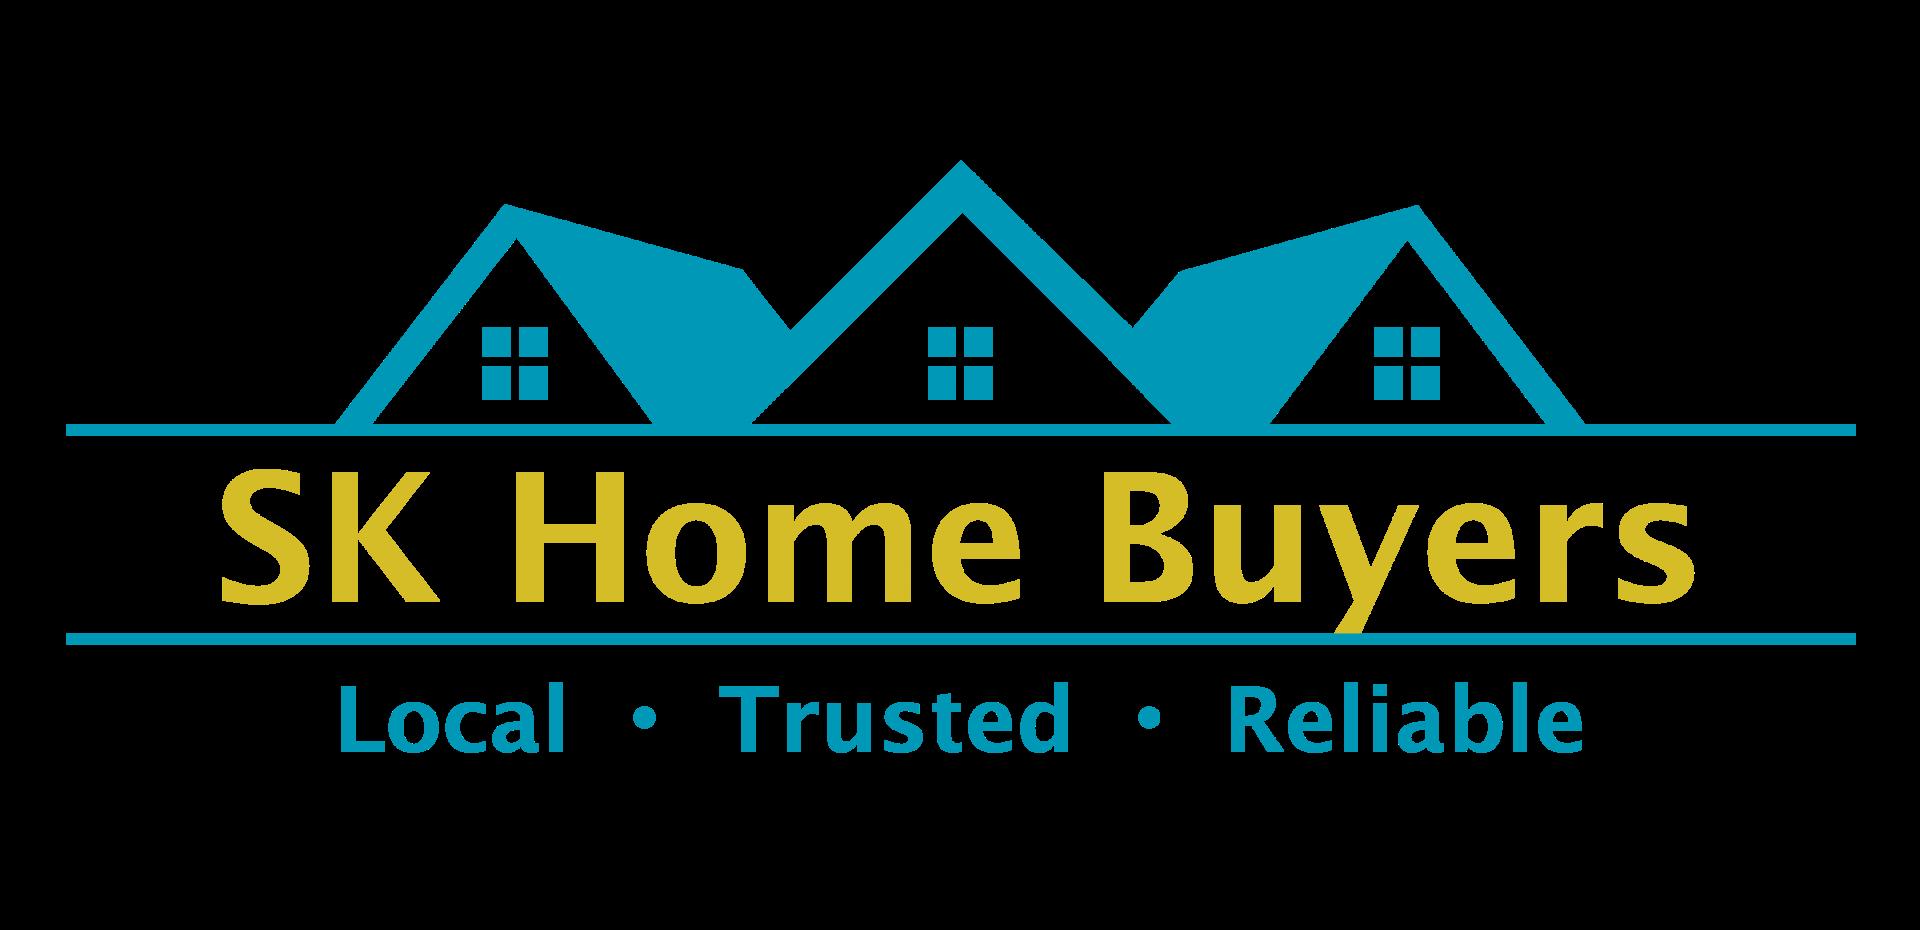 SK Home Buyers logo